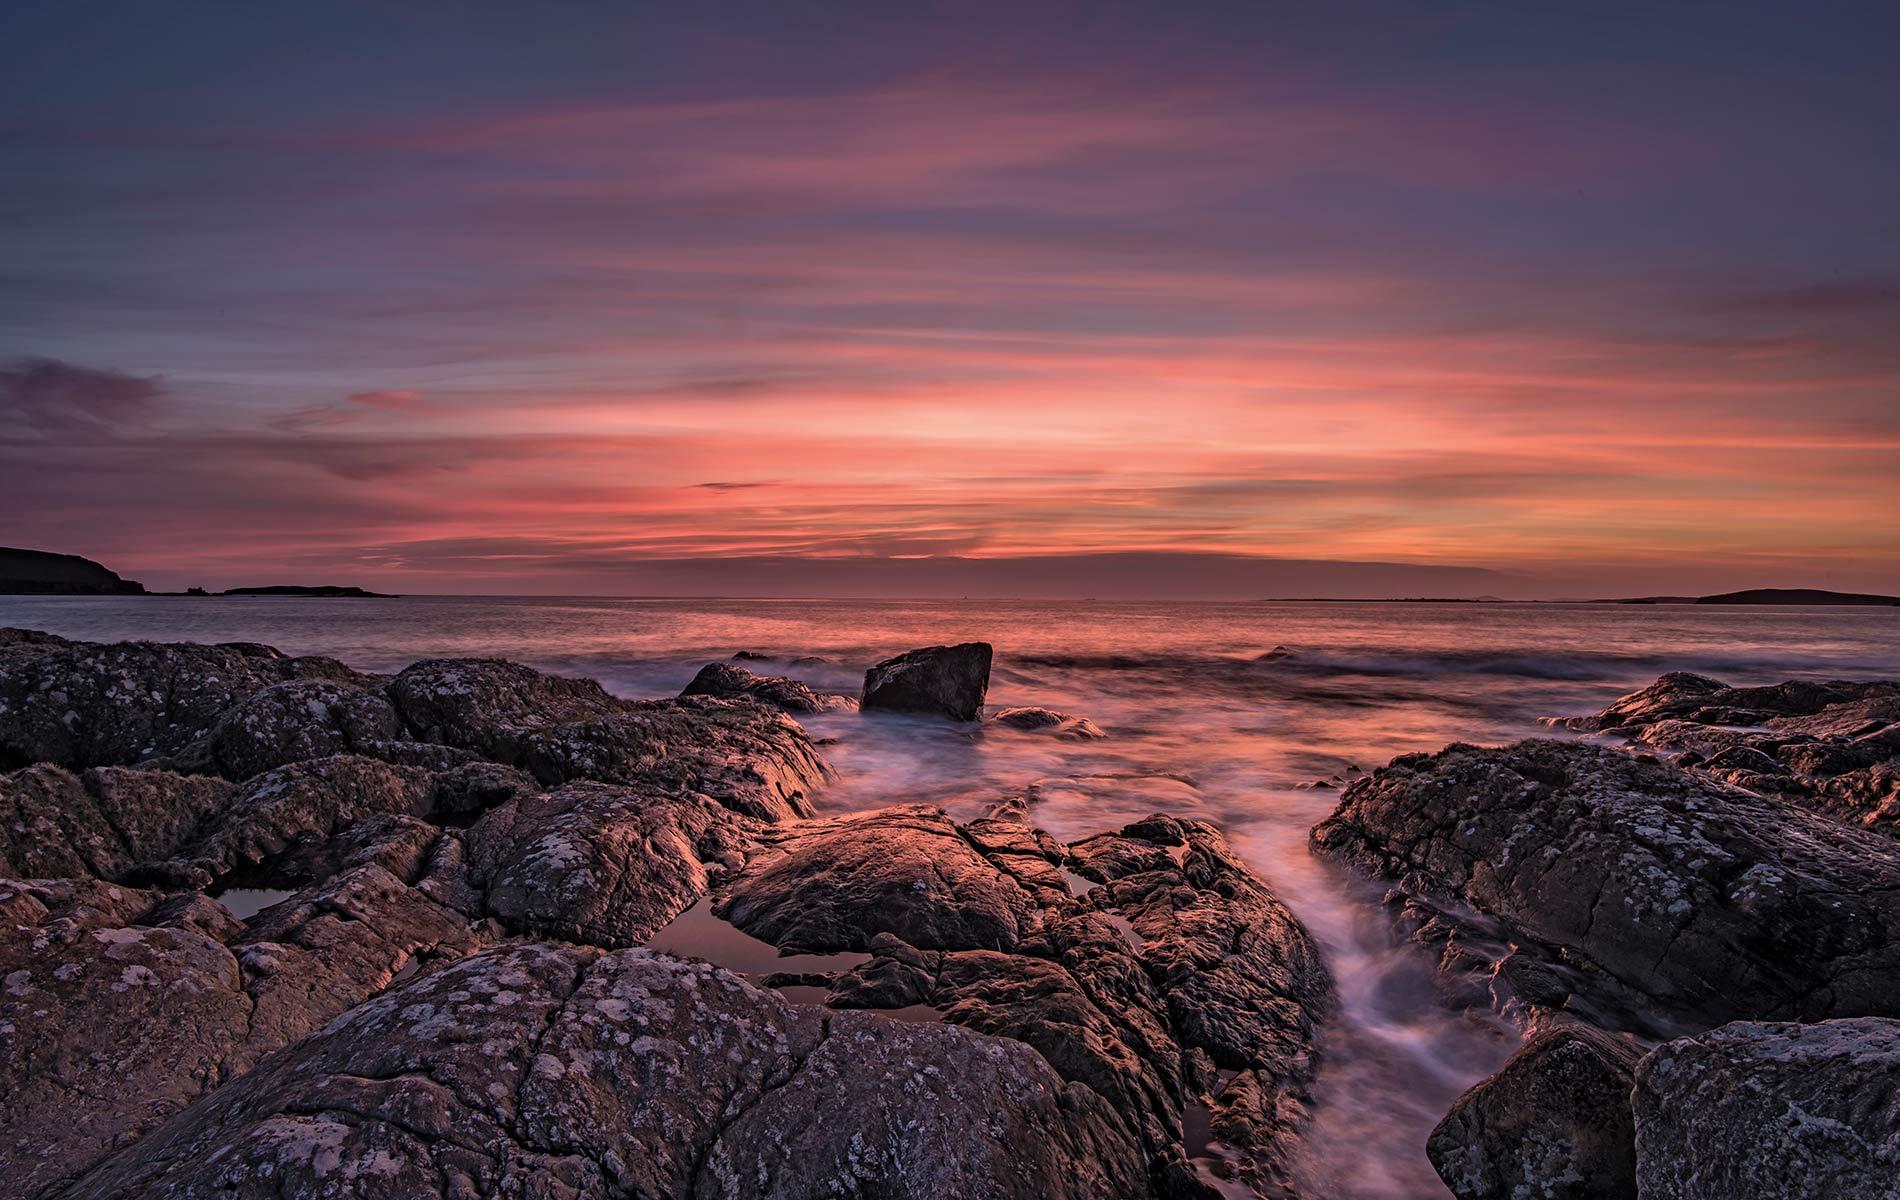 An early autumn sunset off the Errislannan Peninsula. Photo by Mark Furniss